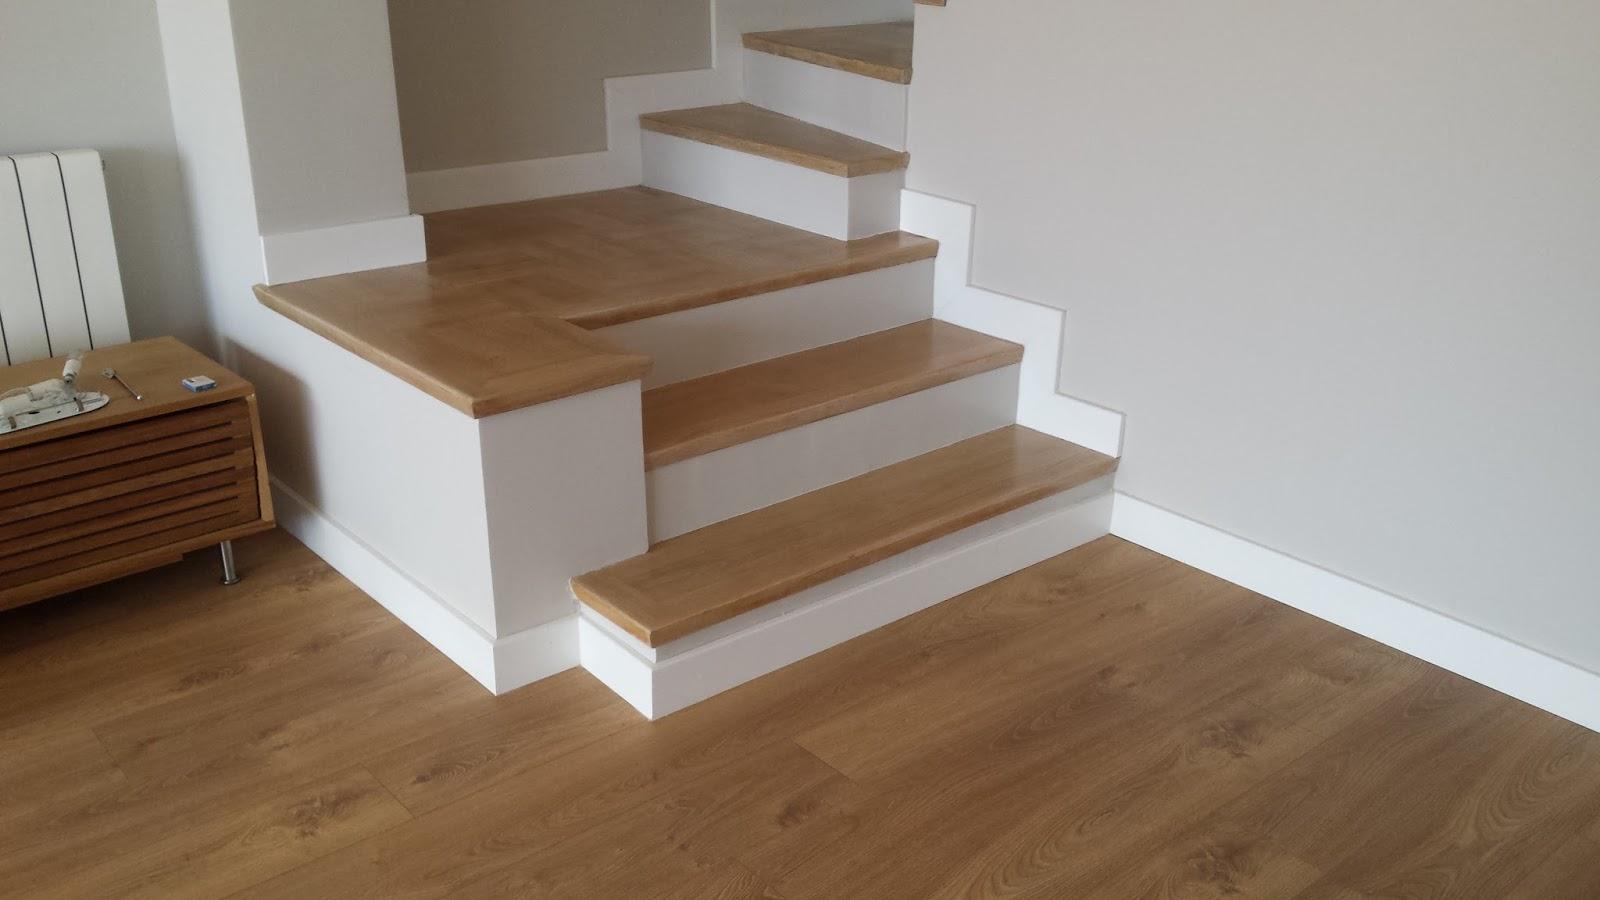 Acuchillar o restaurar una escalera de madera for Como trazar una escalera de madera